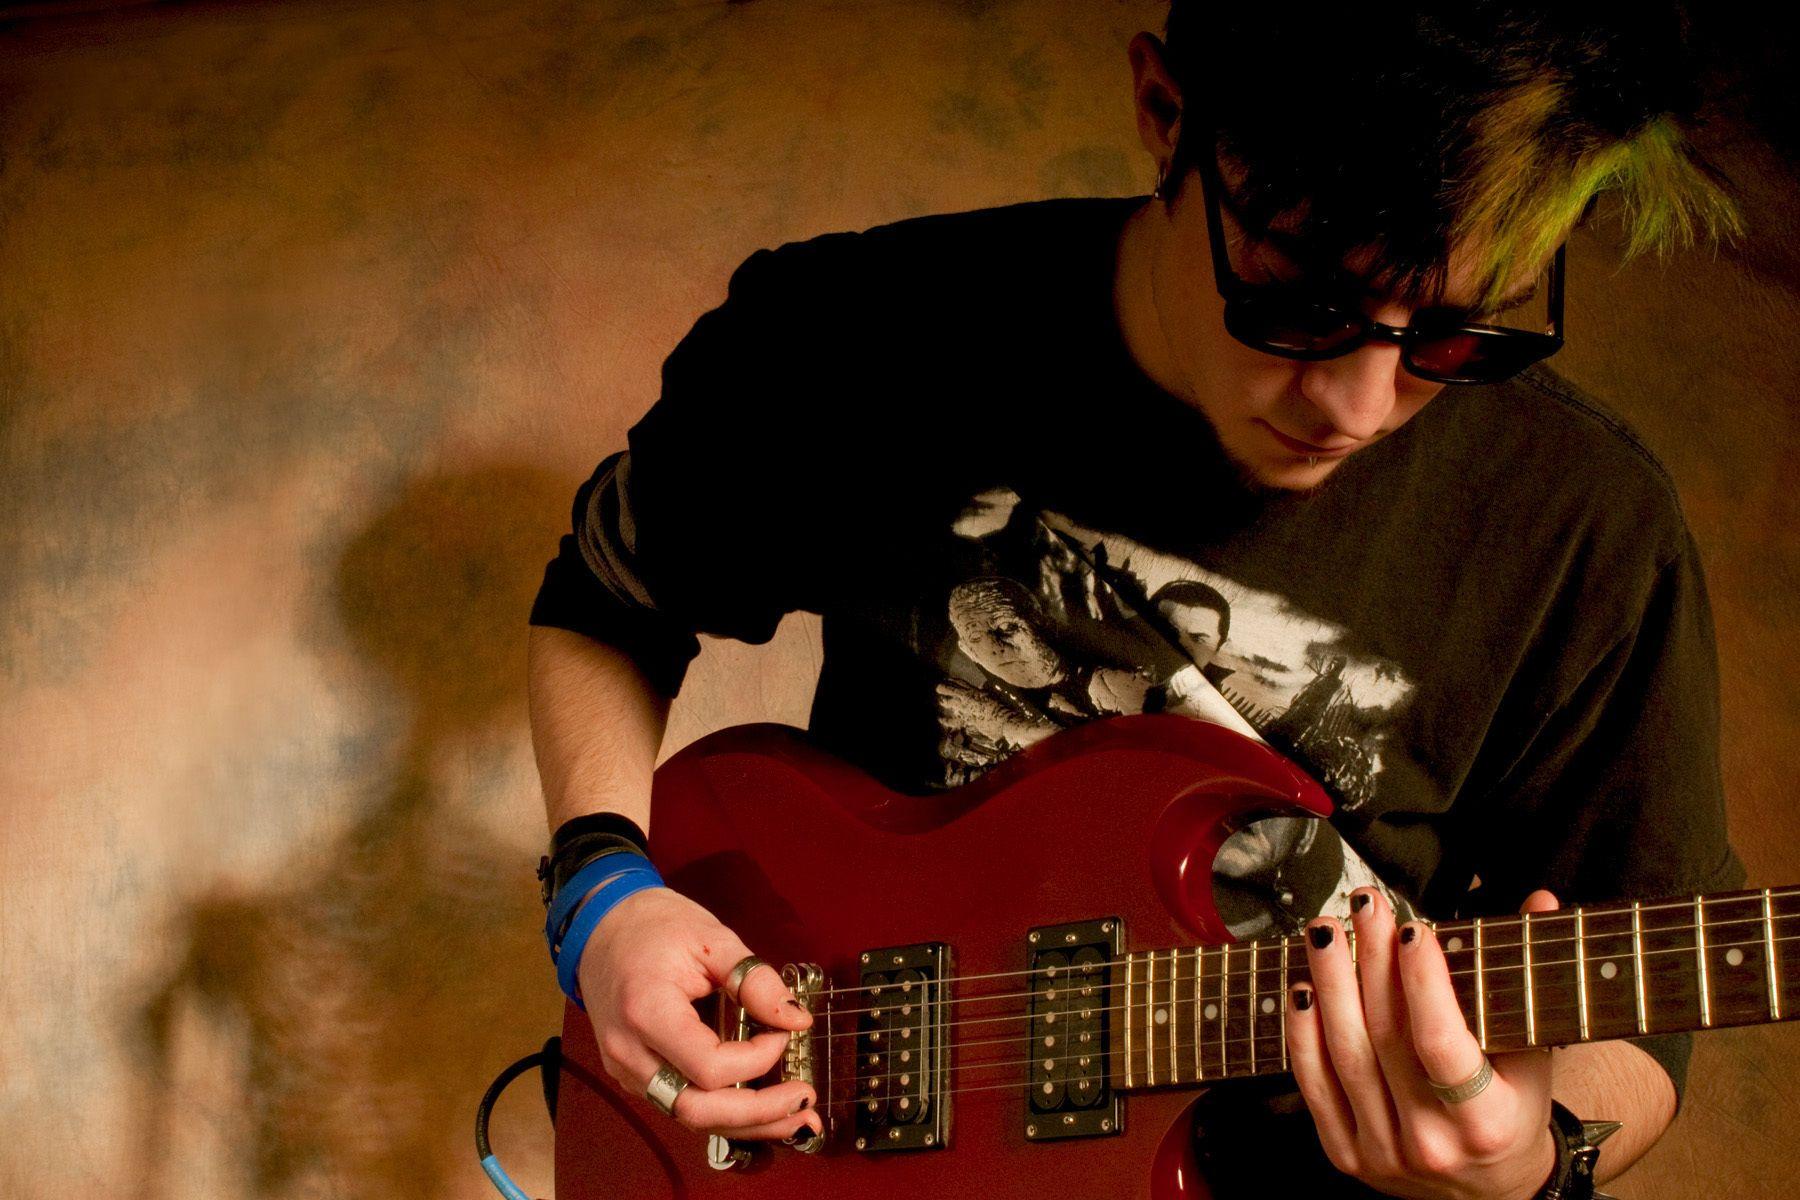 Timmy Points, Composer, guitatist, singer